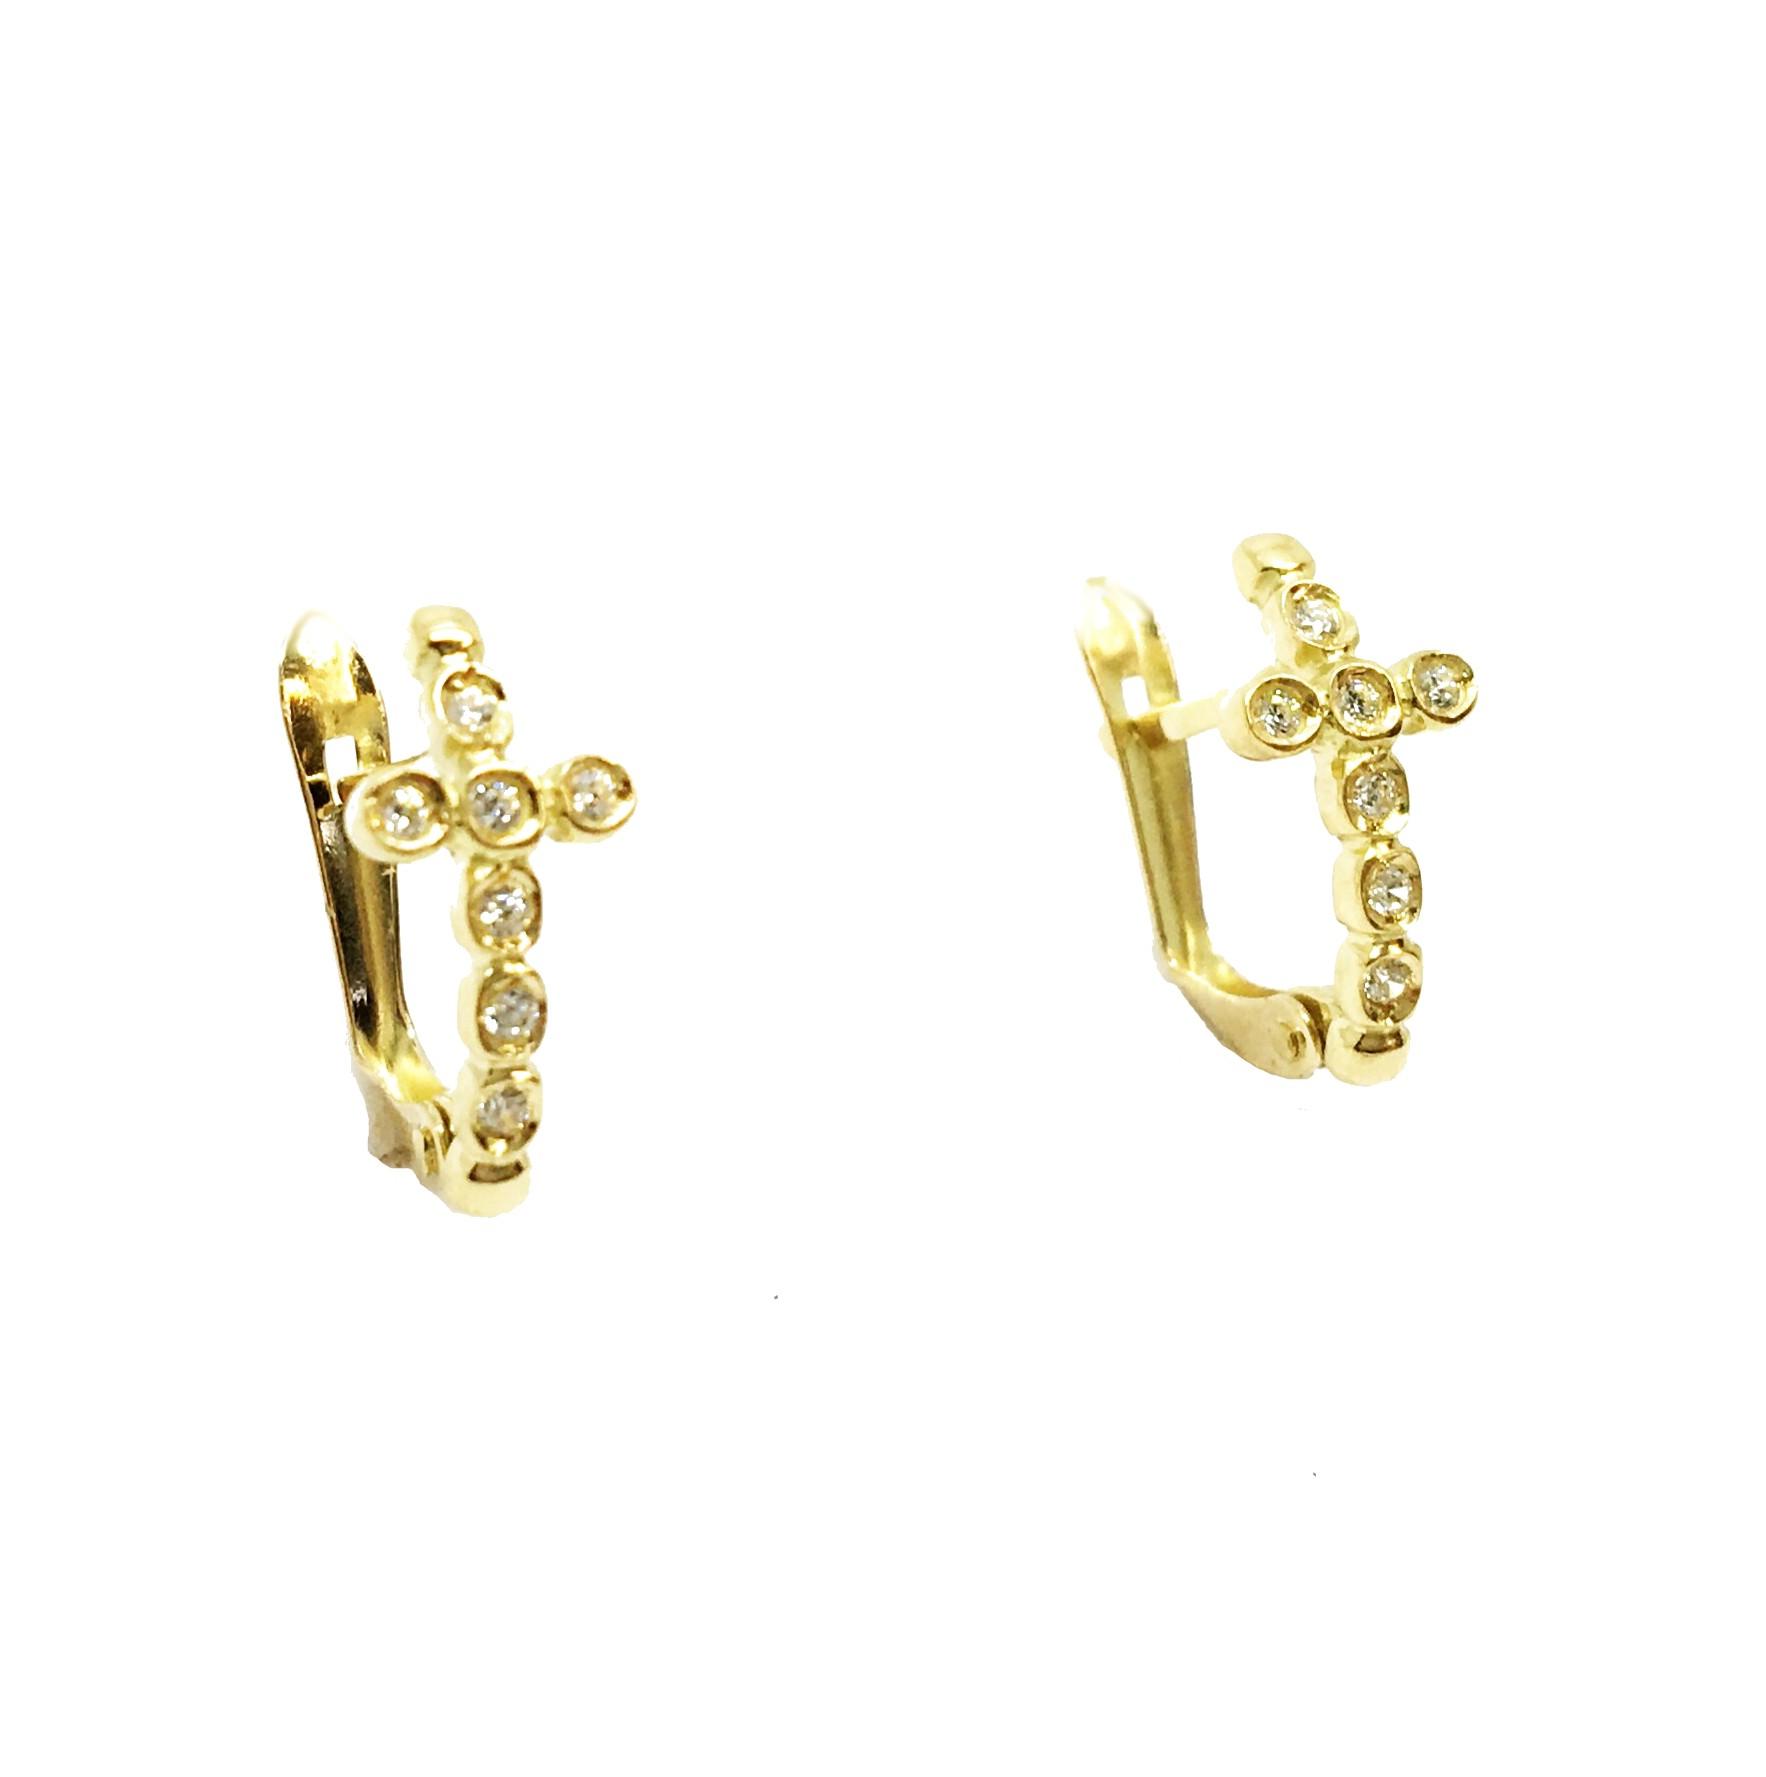 9330929c8844 Pendientes de oro Cruz Joyería Juan Luis Larráyoz Pamplona